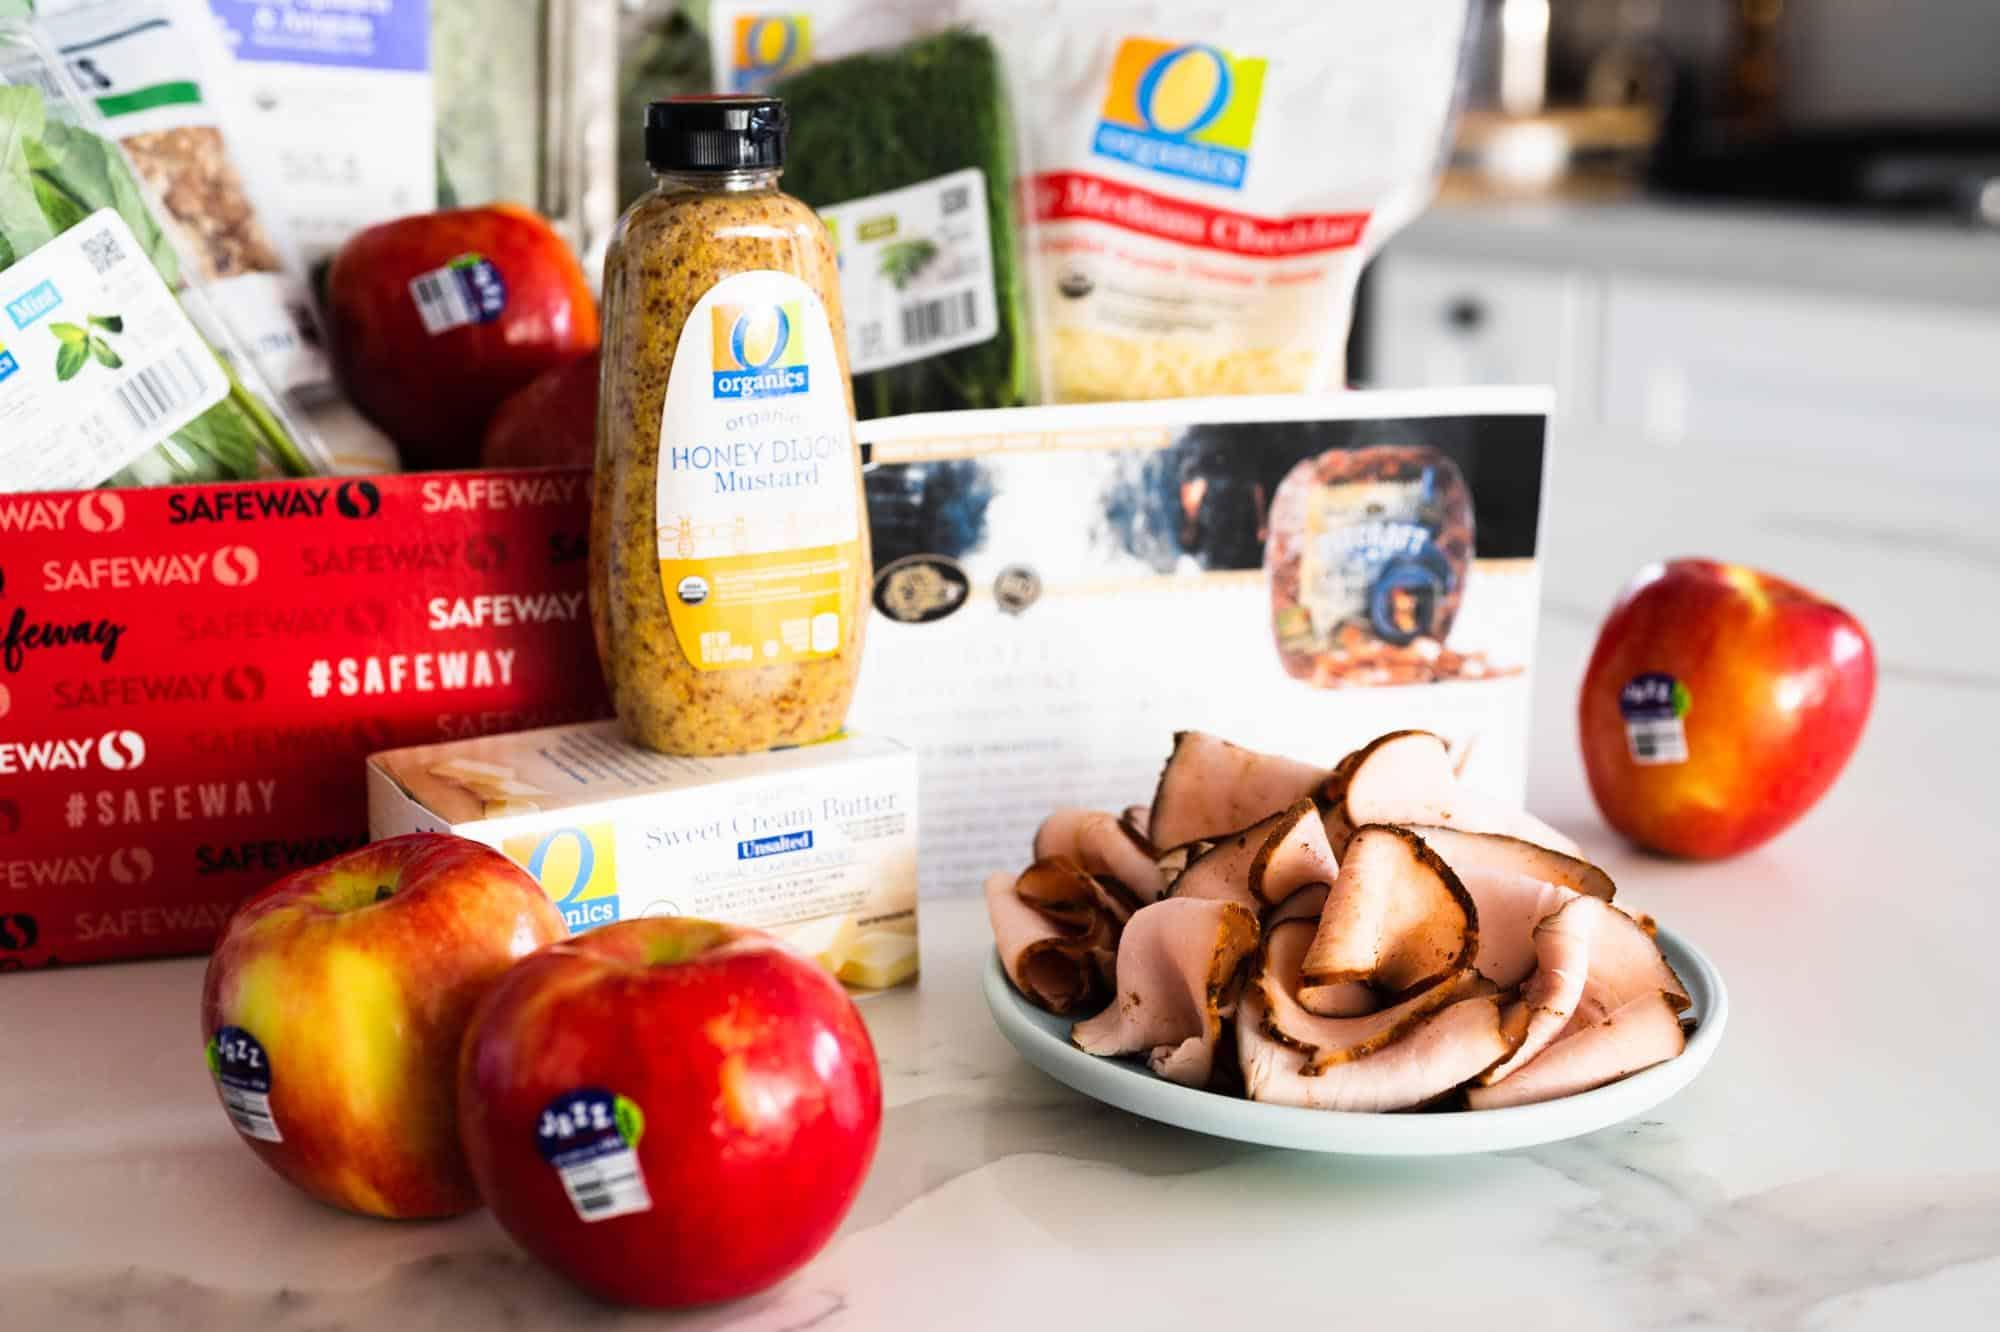 Pig and Quill Safeway Shopping O Organics Jazz Apples Boar's Head Turkey